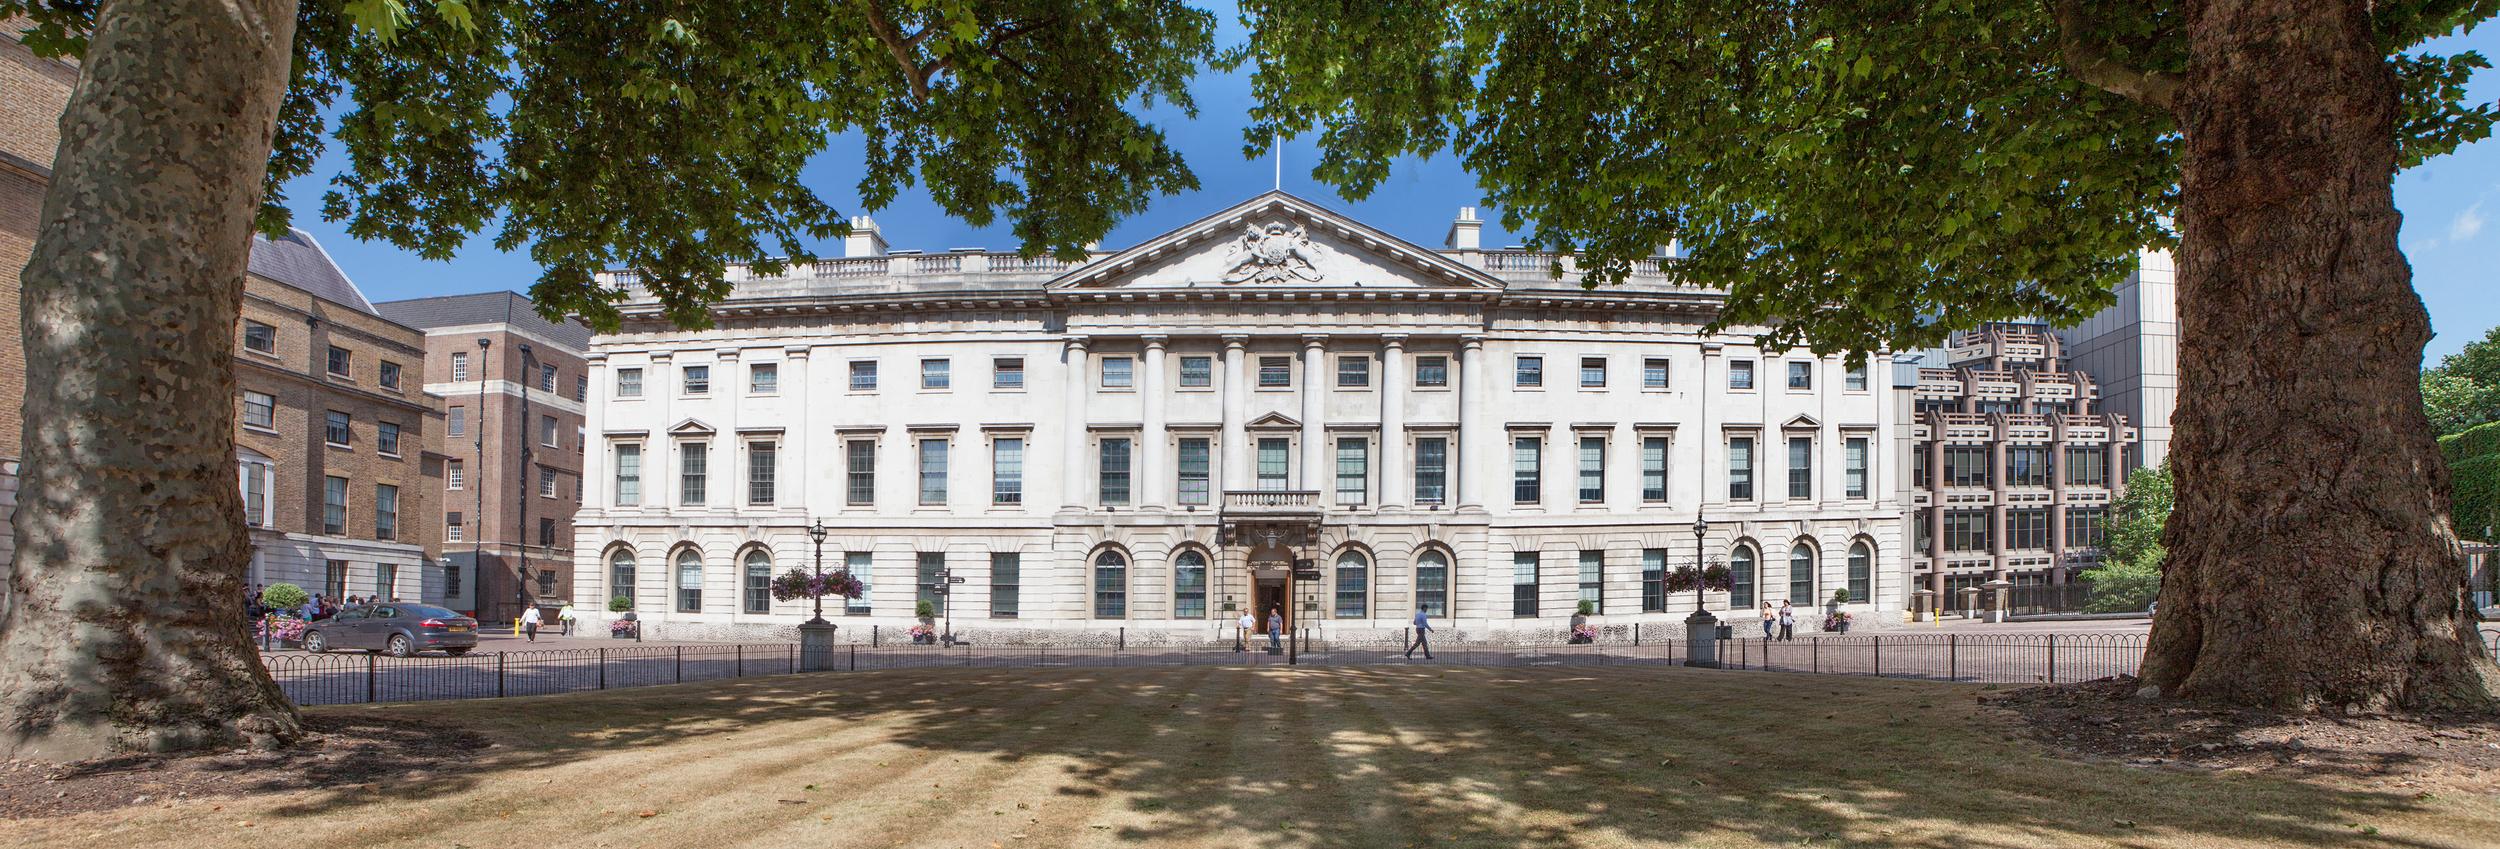 The Royal Mint, London